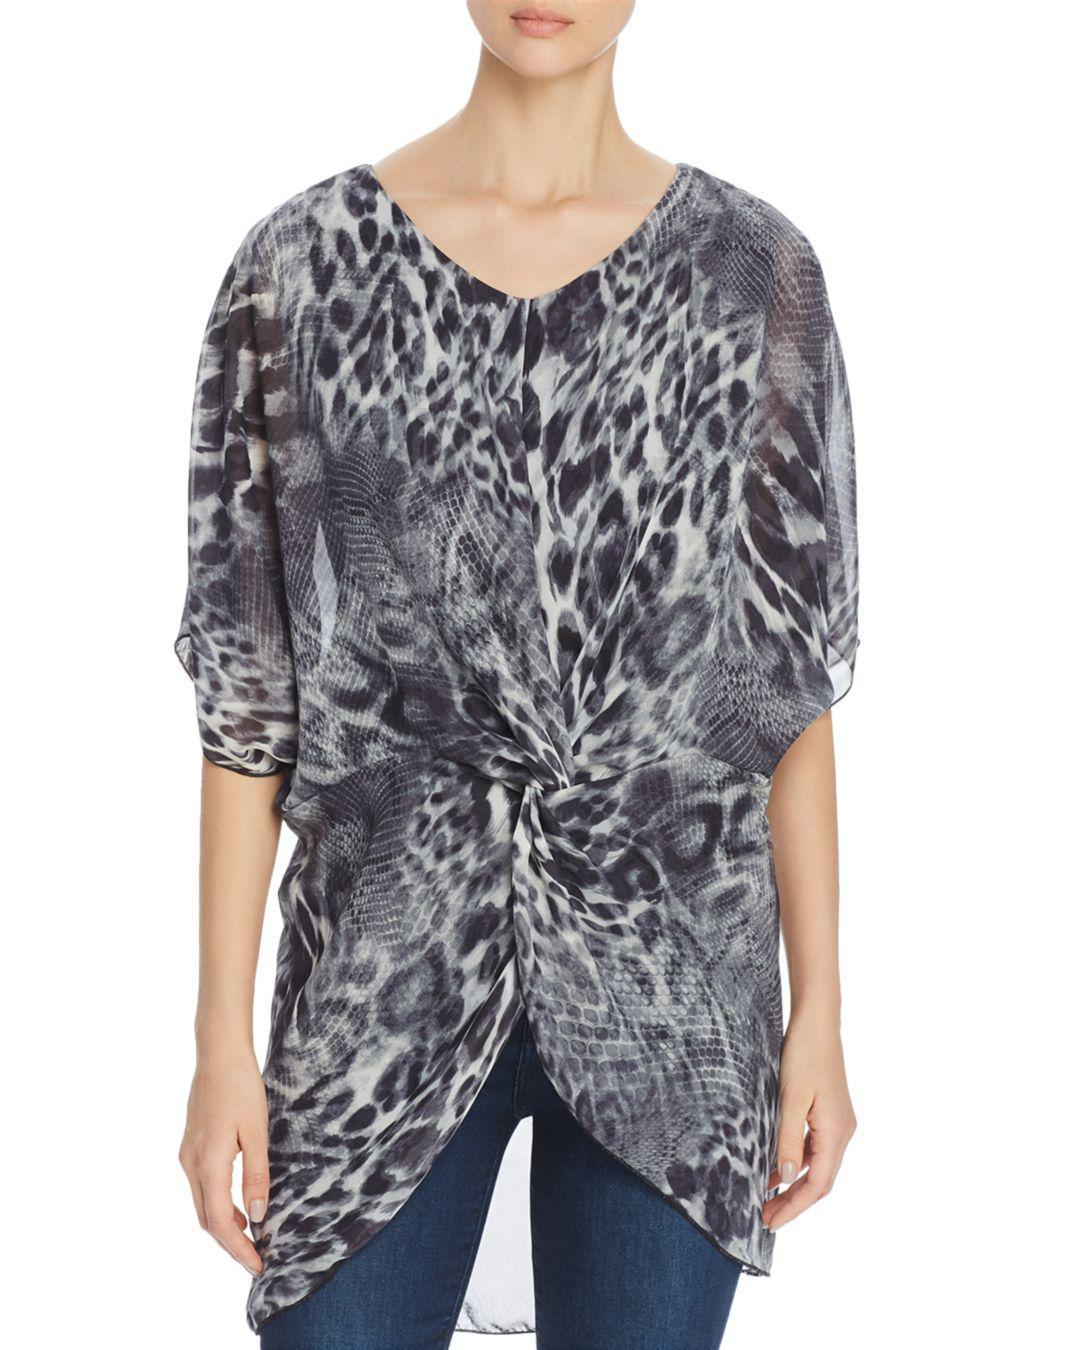 8280ad1e7427e Kim   Cami Animal-print High low Tunic Top in Gray - Lyst